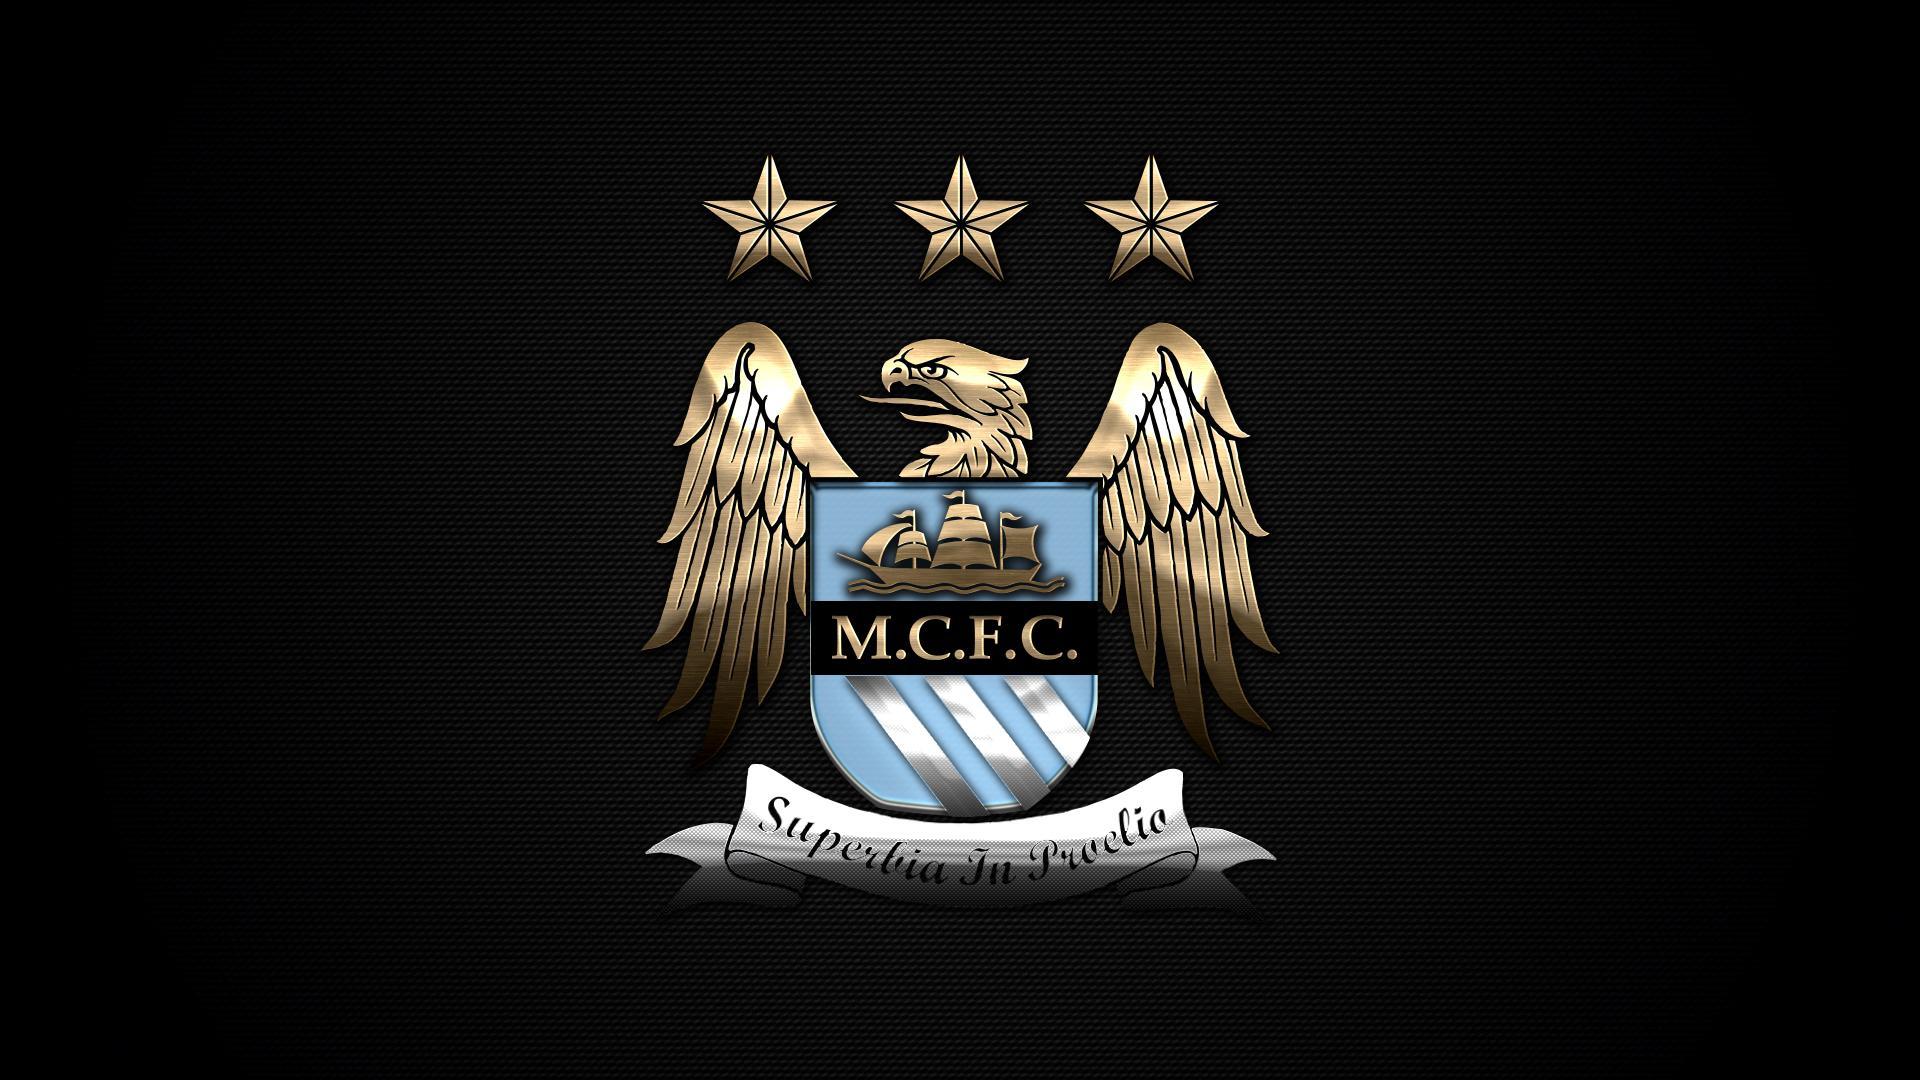 Manchester City Emblem Hd Computer Wallpapers - Wallpaper Cave